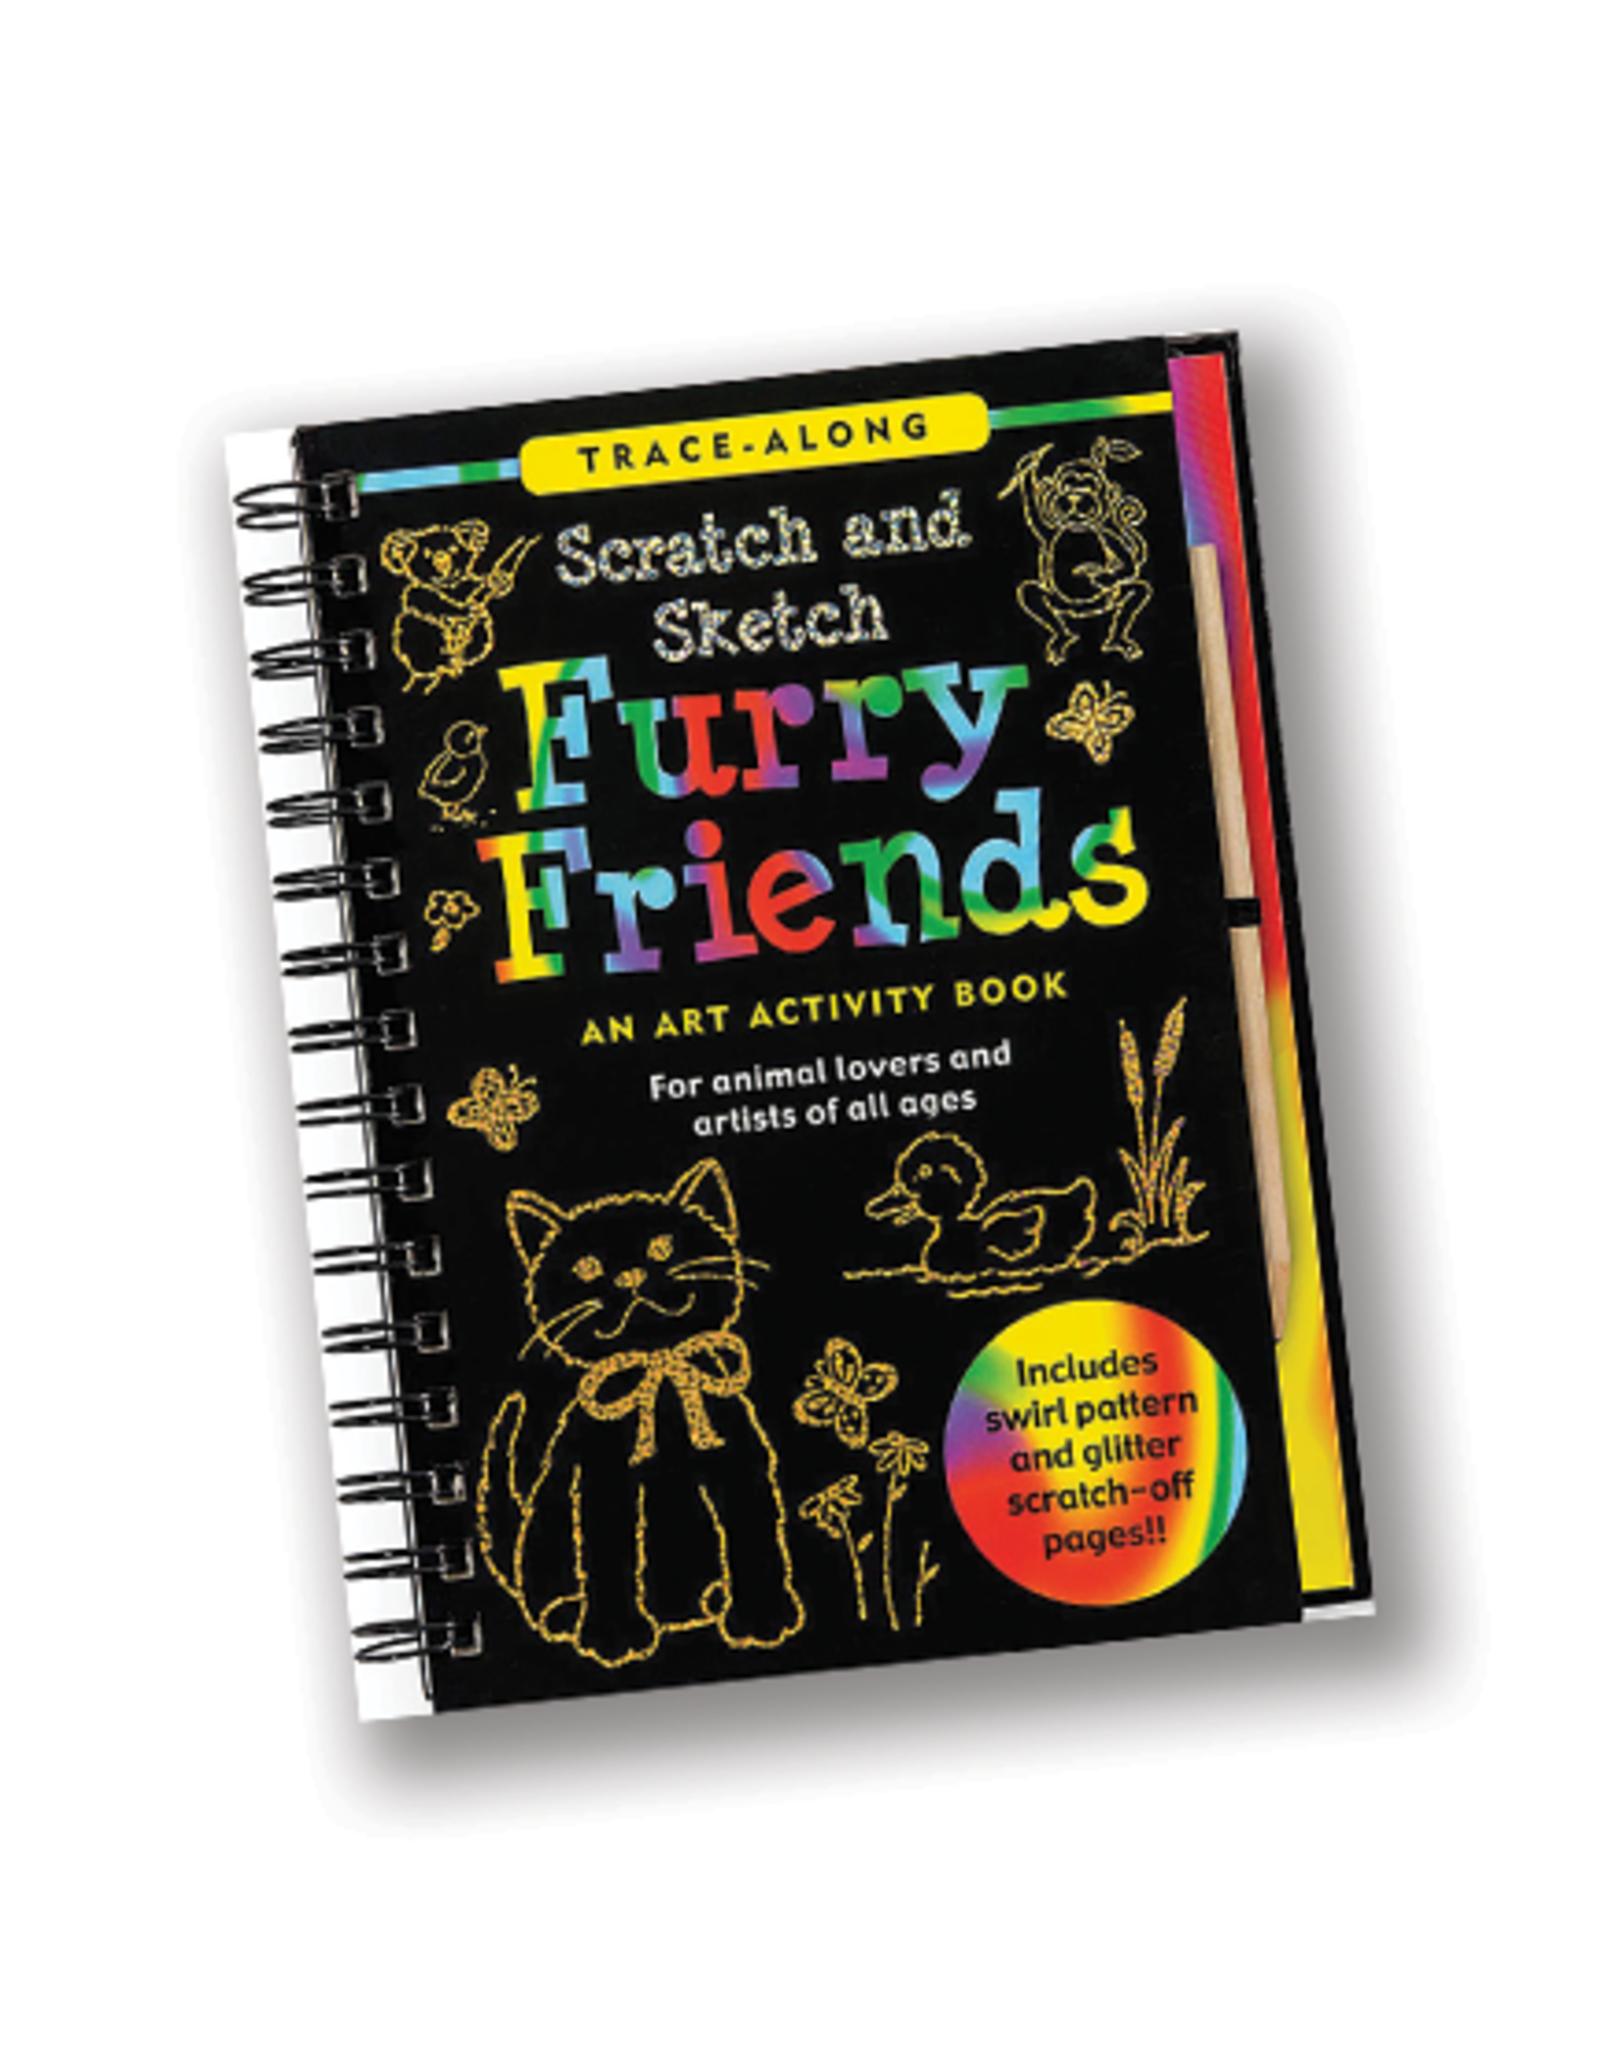 Furry Friends Scratch & Sketch Art Activity Book